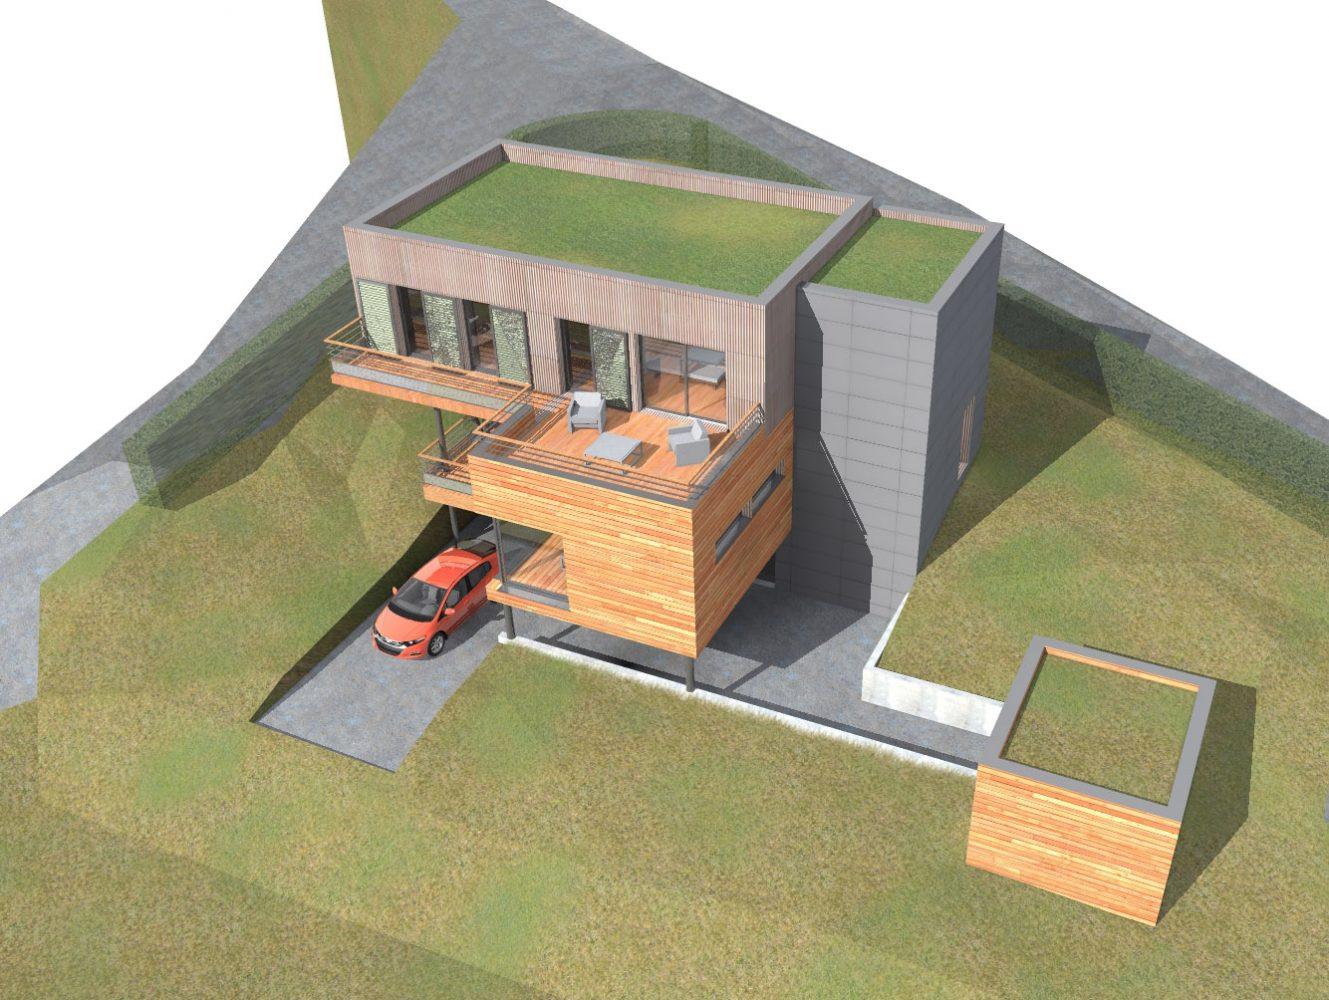 plan maison terrain en pente descendante ventana blog. Black Bedroom Furniture Sets. Home Design Ideas